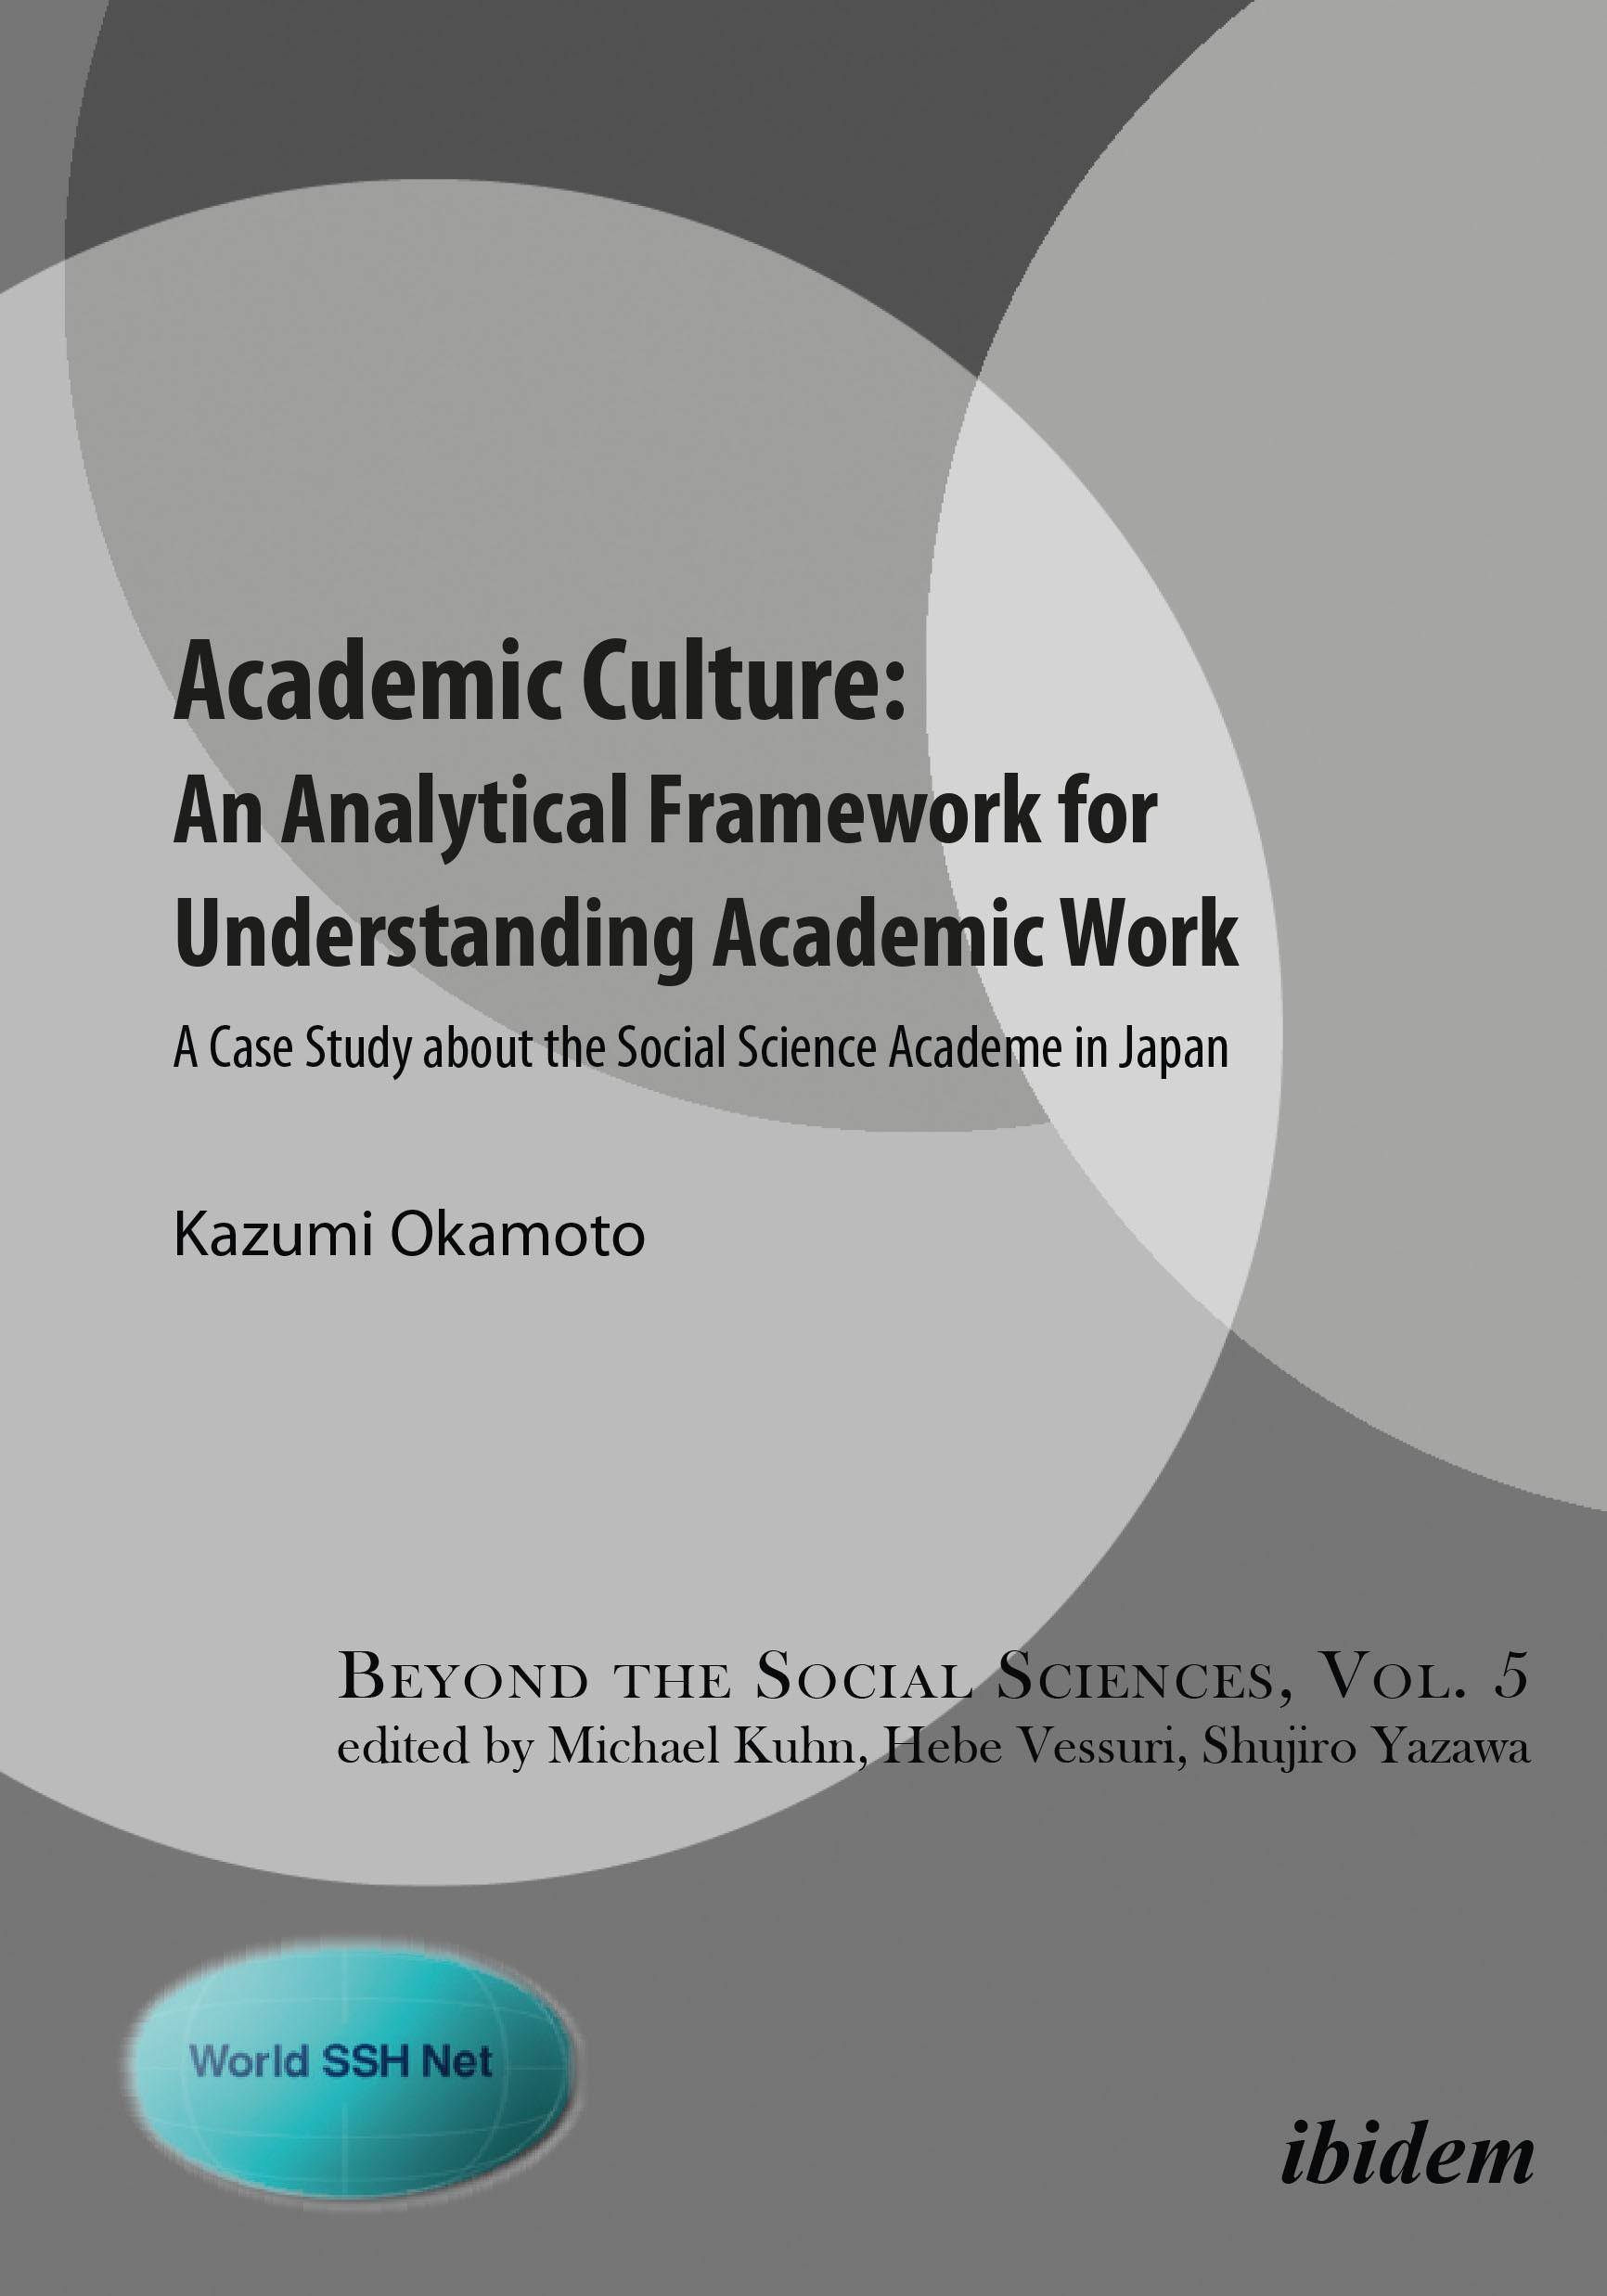 Academic Culture: An Analytical Framework for Understanding Academic Work